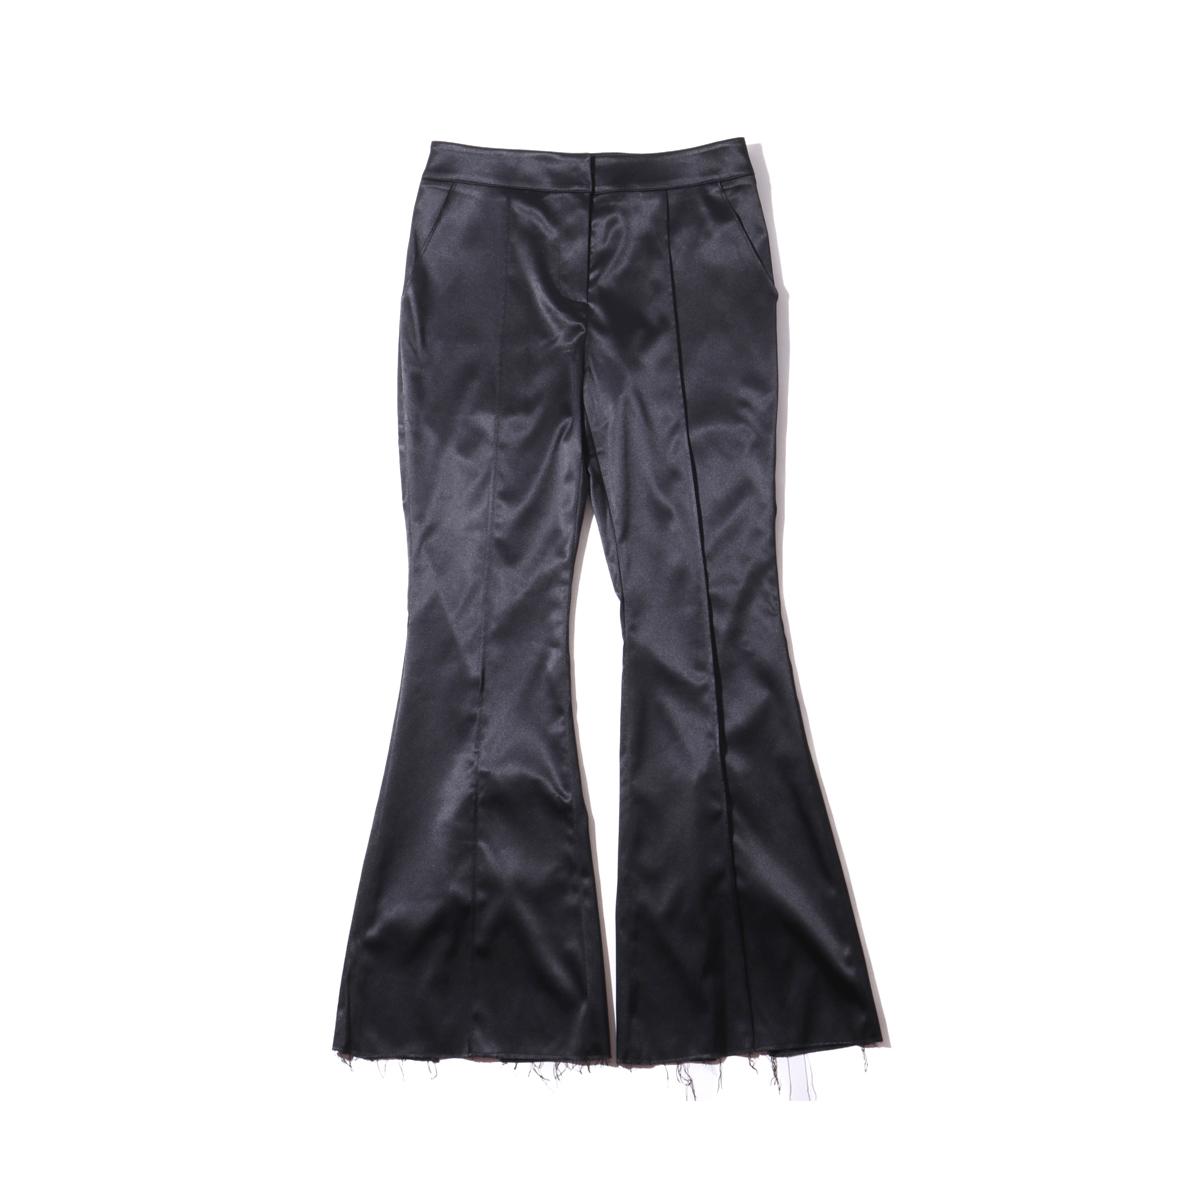 eyeye LACE UP PANTS (アイアイ レースアップ パンツ)BLACK【レディース パンツ】19SP-I